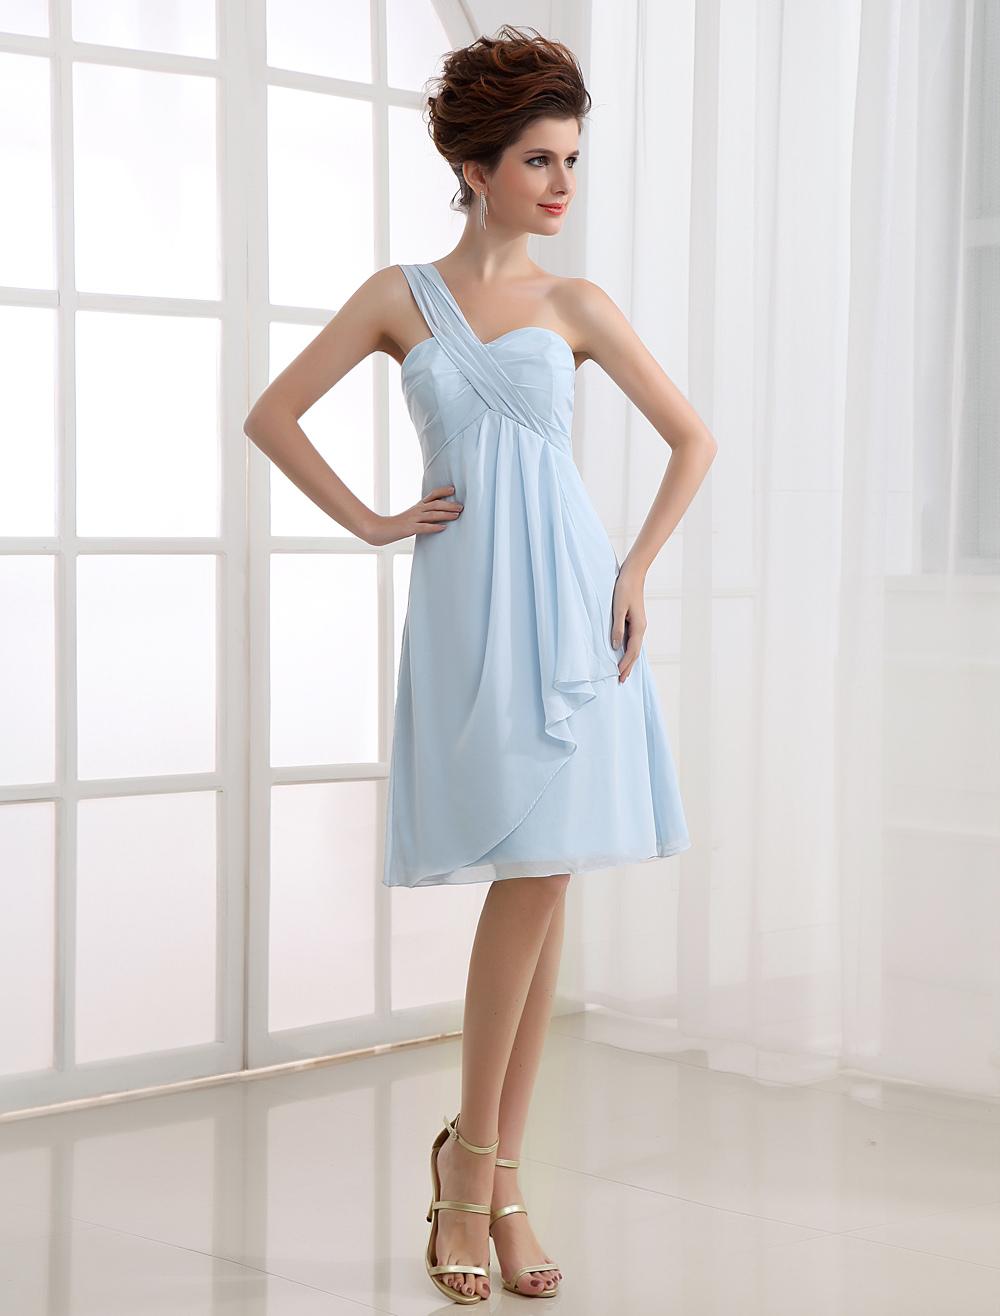 Pastel Blue Prom Dress One Shoulder A Line Chiffon Short Party Dress (Wedding Cheap Party Dress) photo